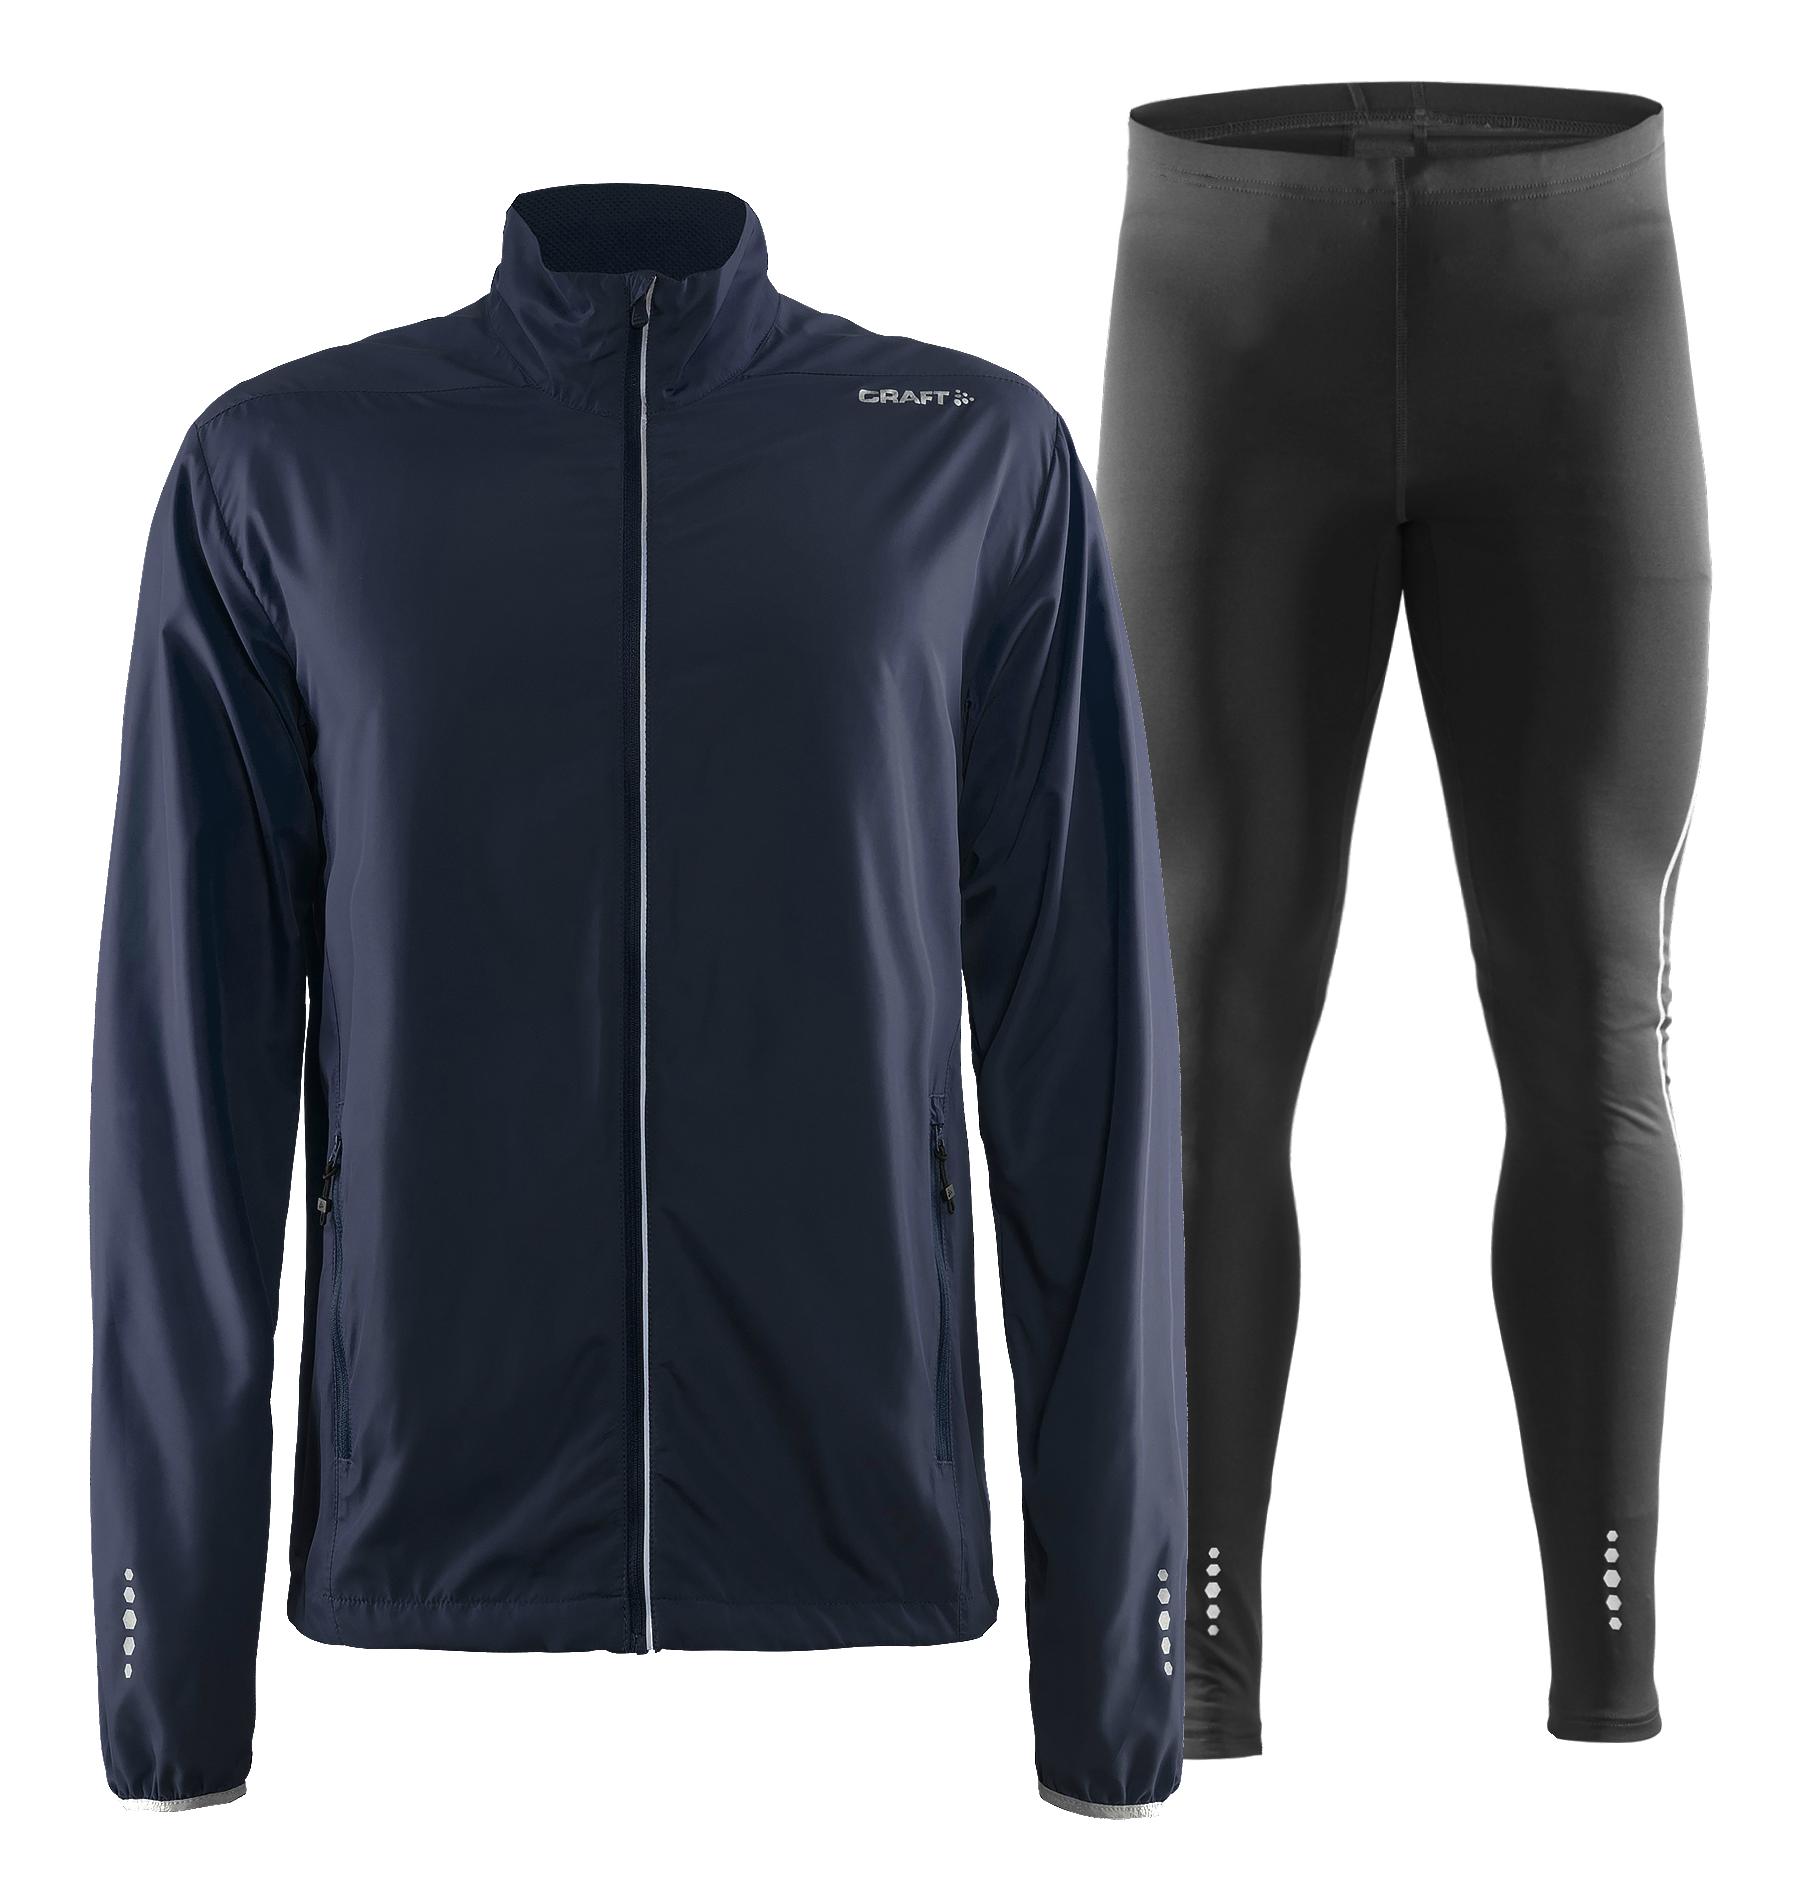 Craft Mind Run мужской костюм для бега темно-синий